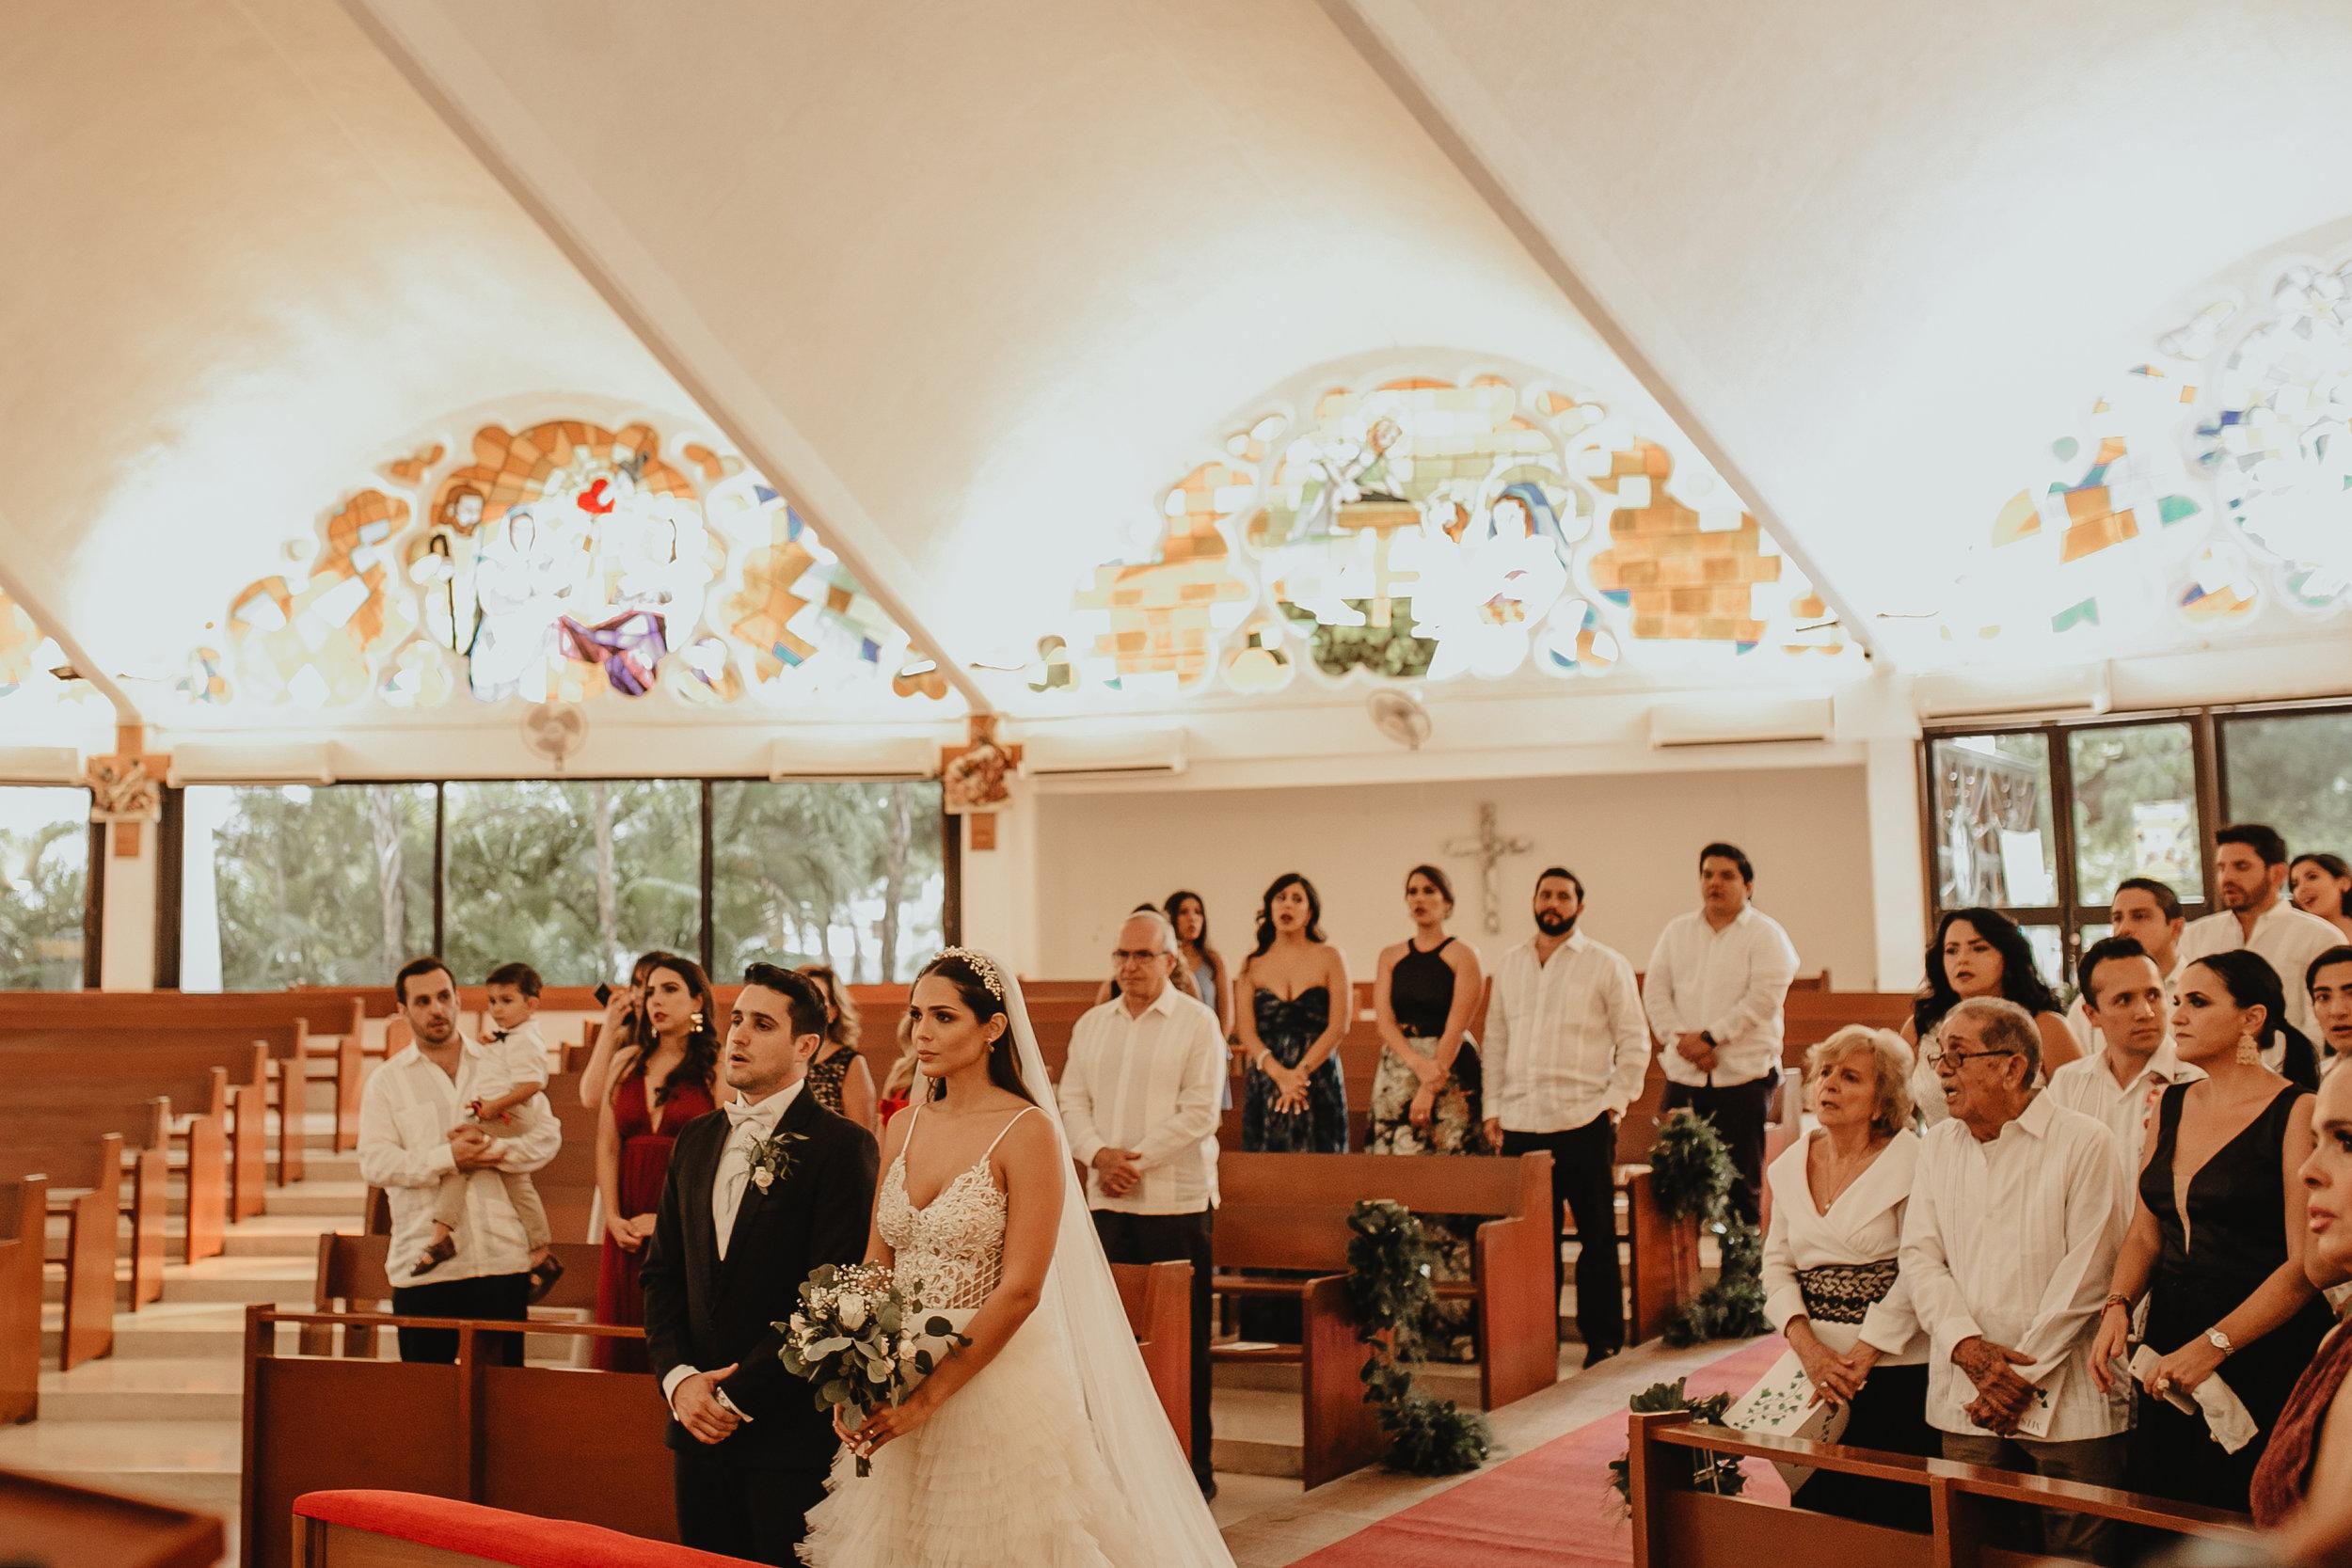 0583R&F__WeddingDestination_Weddingmerida_BodaMexico_FotografoDeBodas_FabrizioSimoneenFotografo.jpg